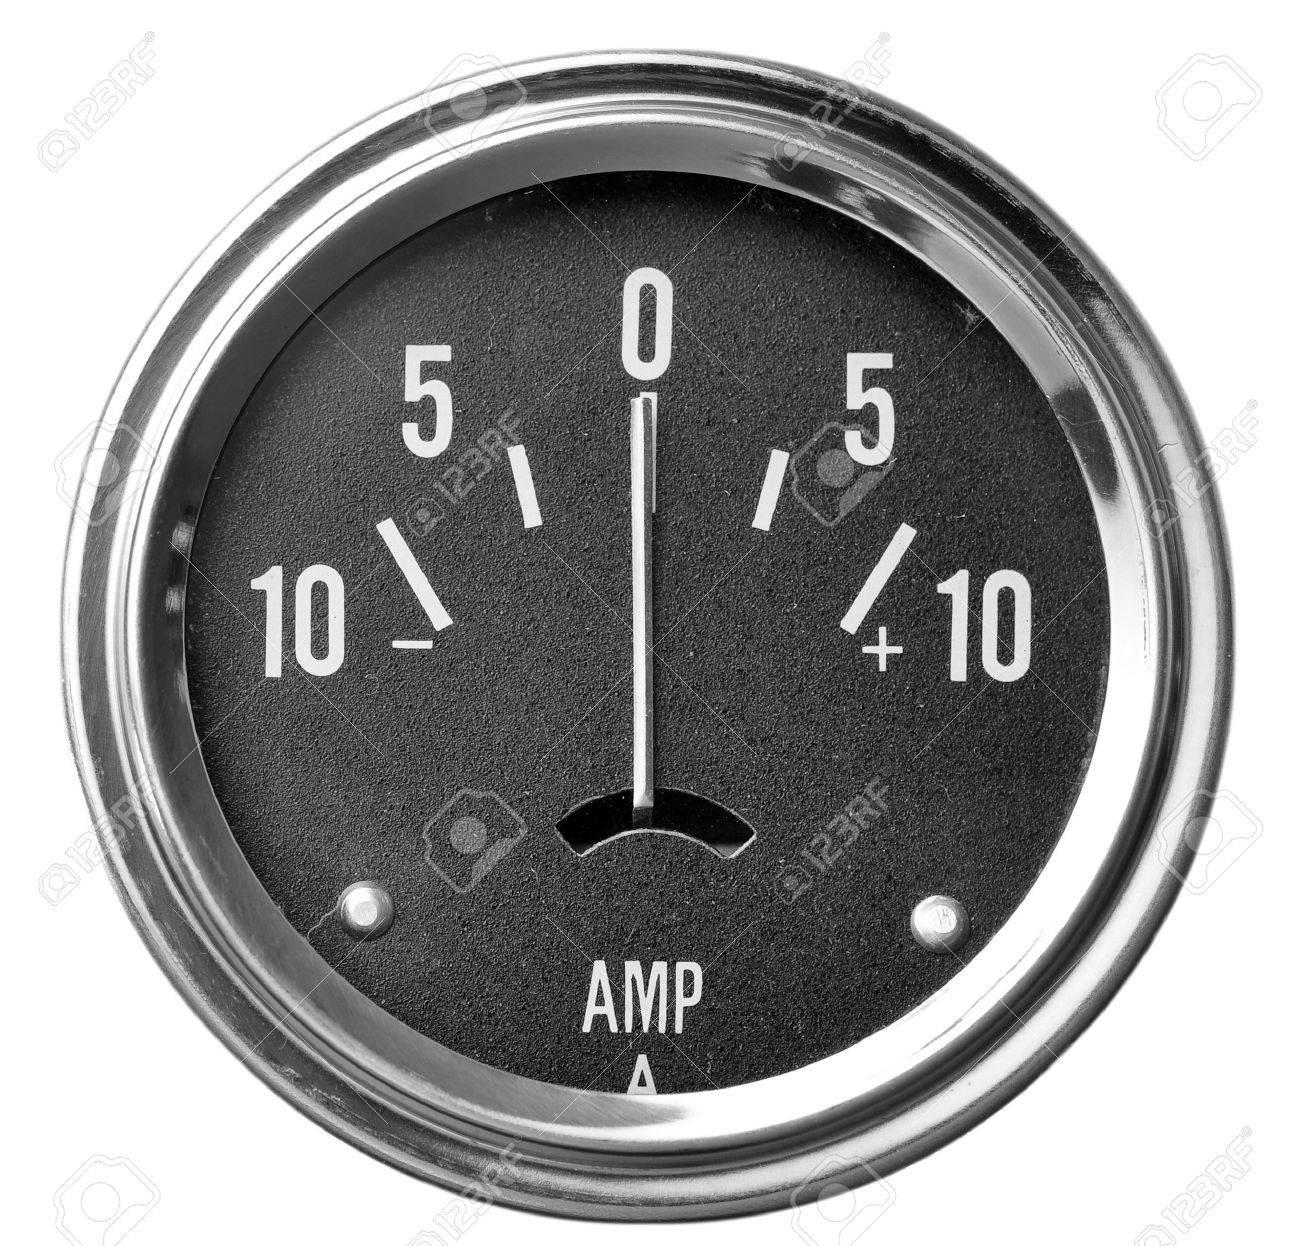 Electrical Amperage (AMP) Gauge Isolated On White Stock Photo ...